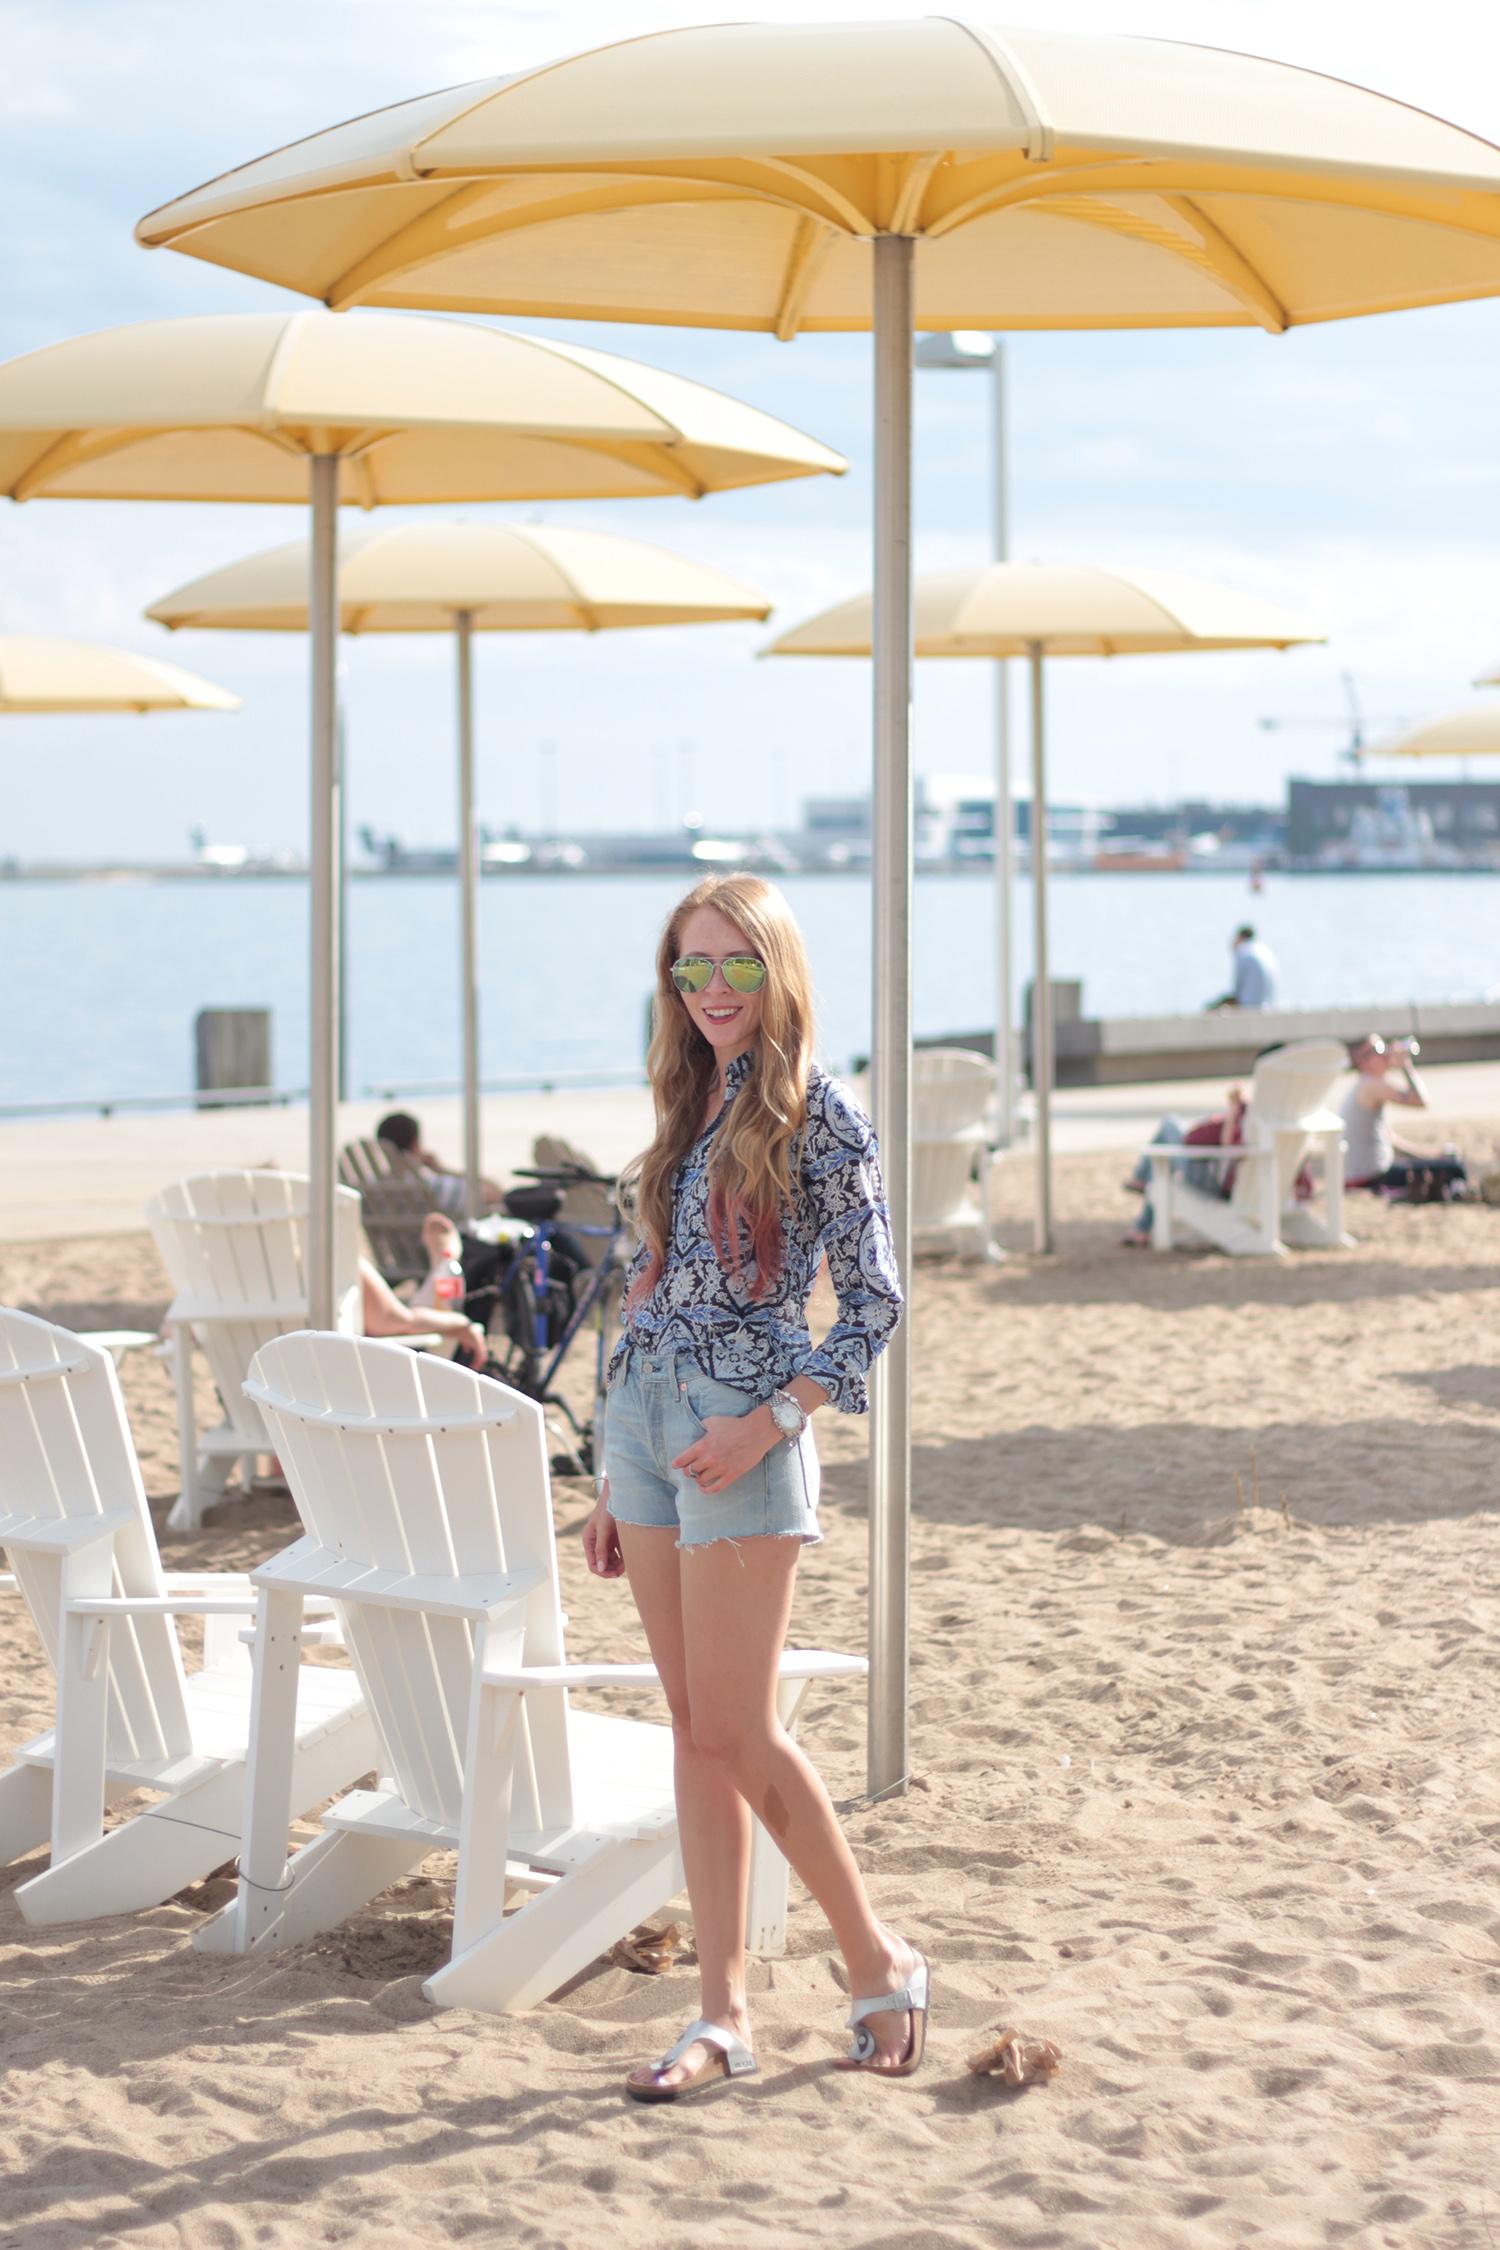 hto park urban beach toronto mirror rayban aviator sunglasses